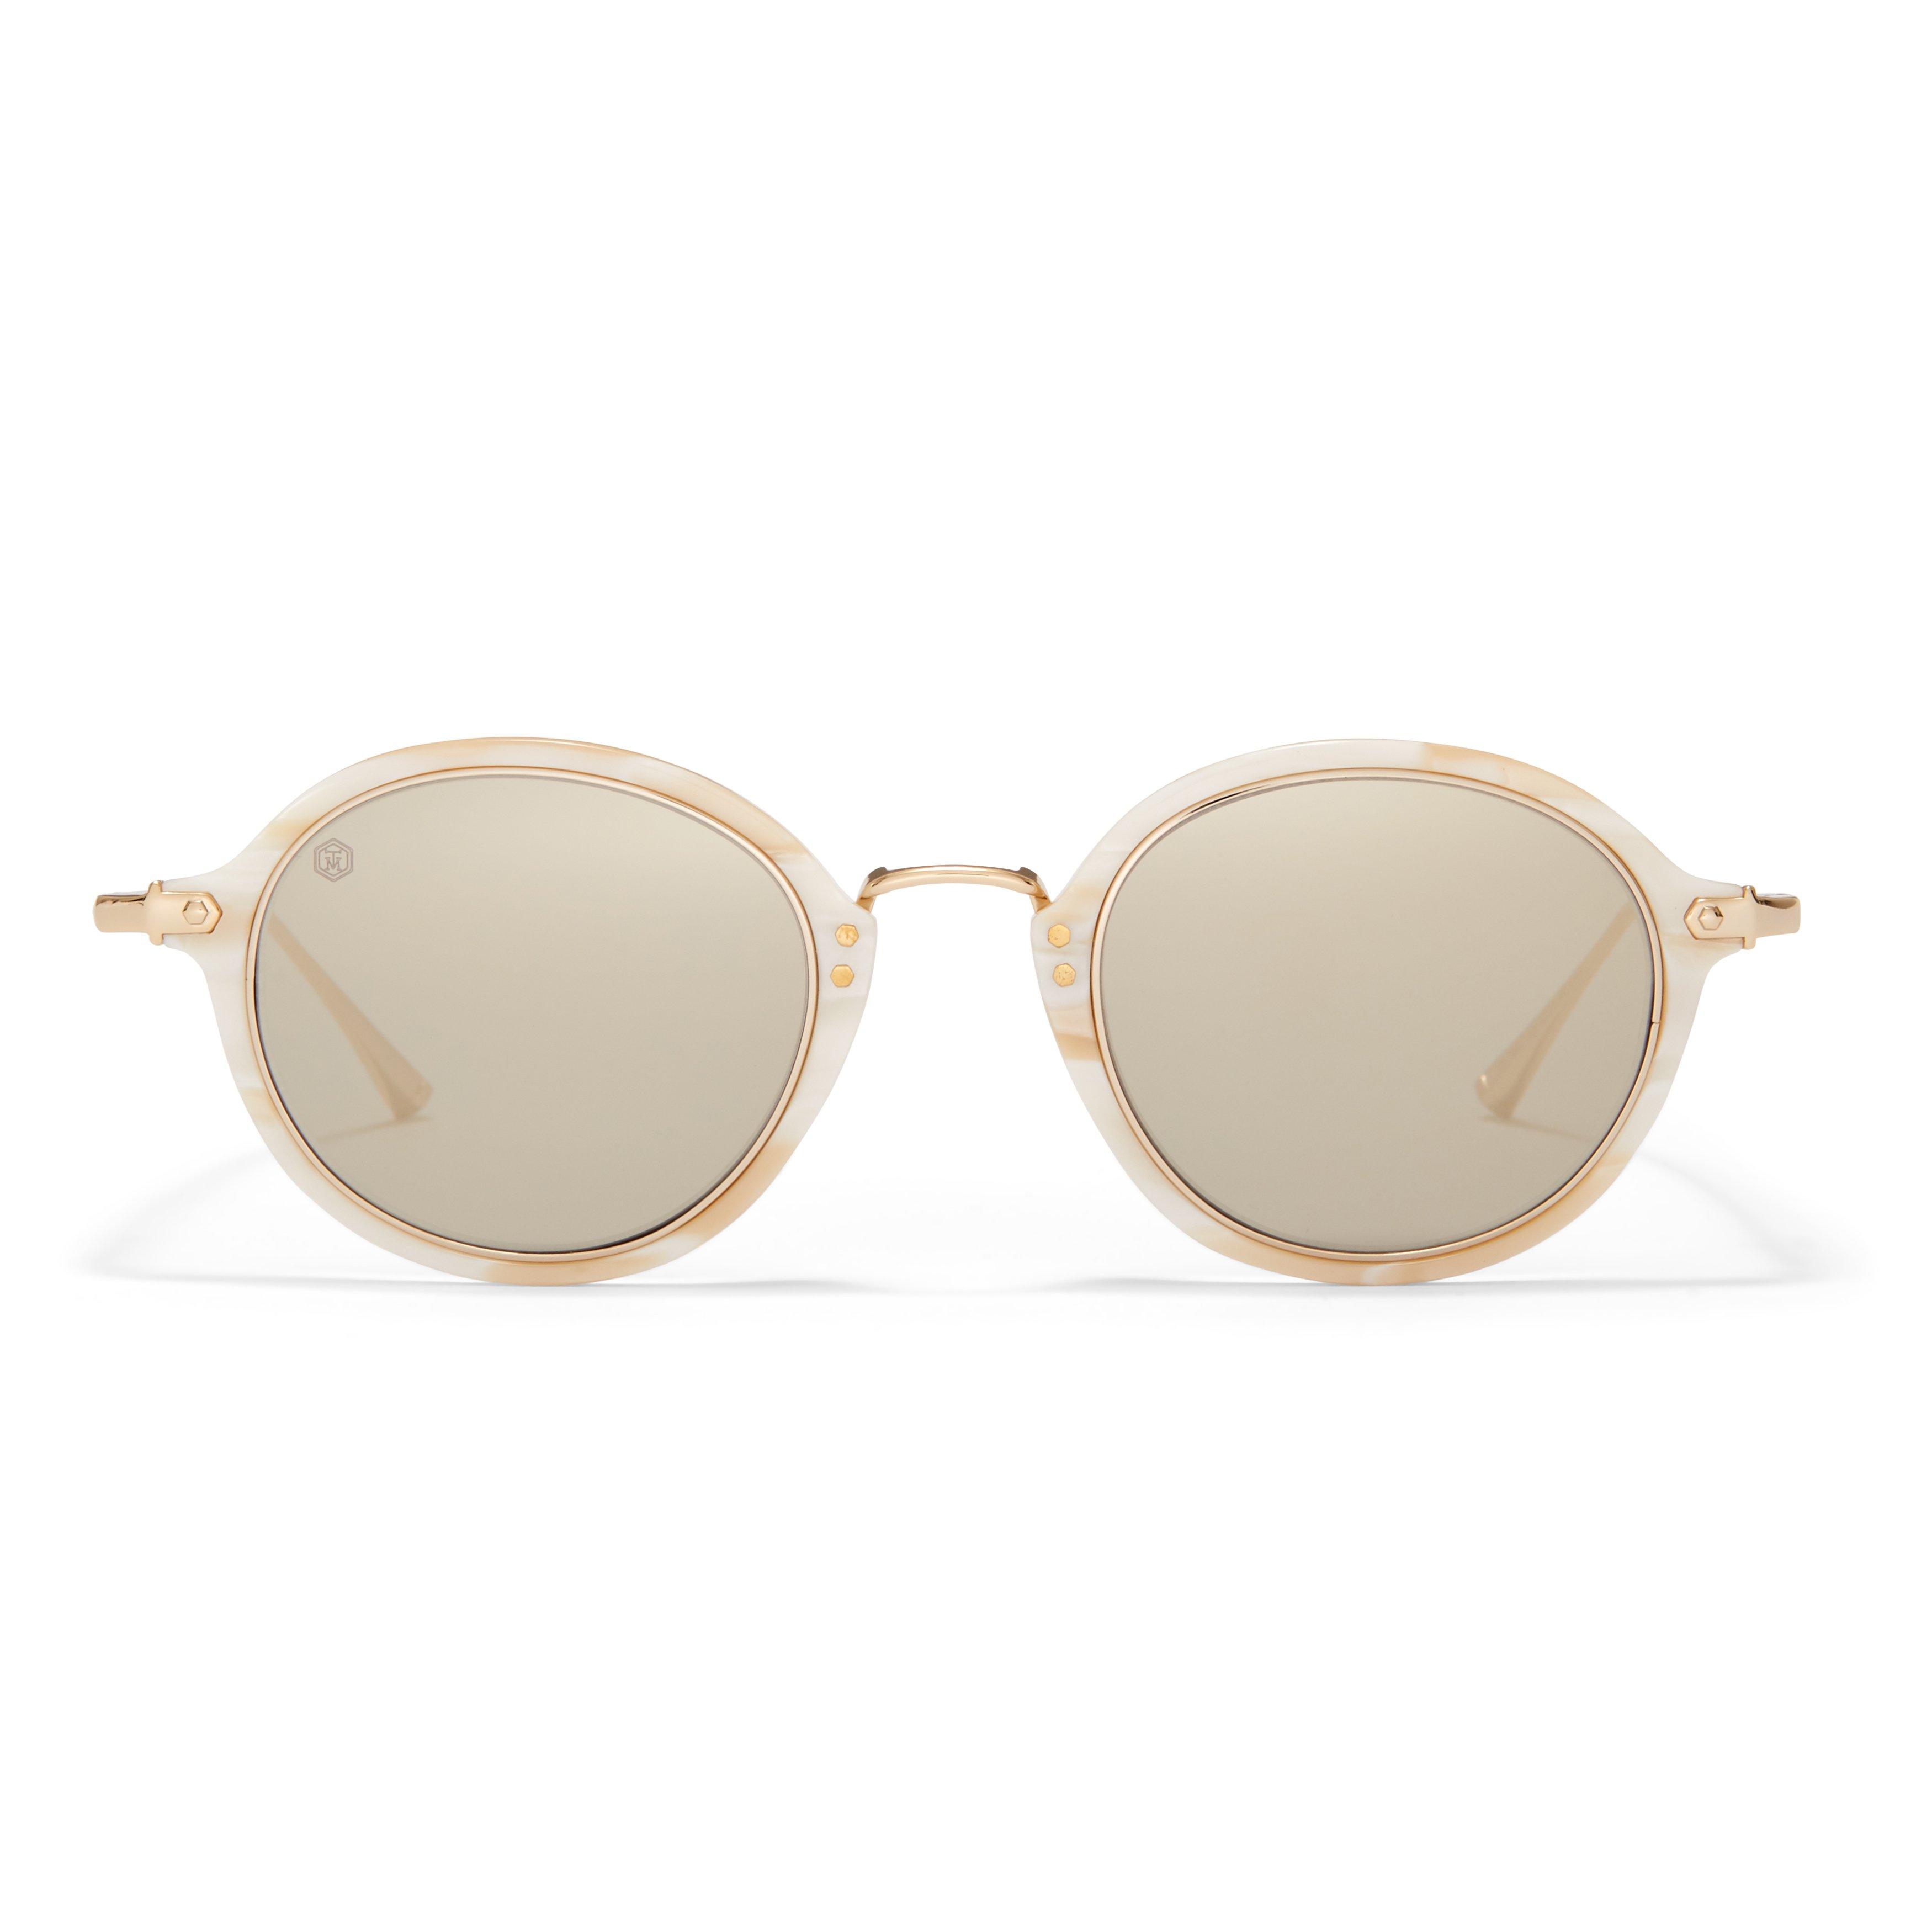 Taylor Morris Golborne Sunglasses, Single Vision